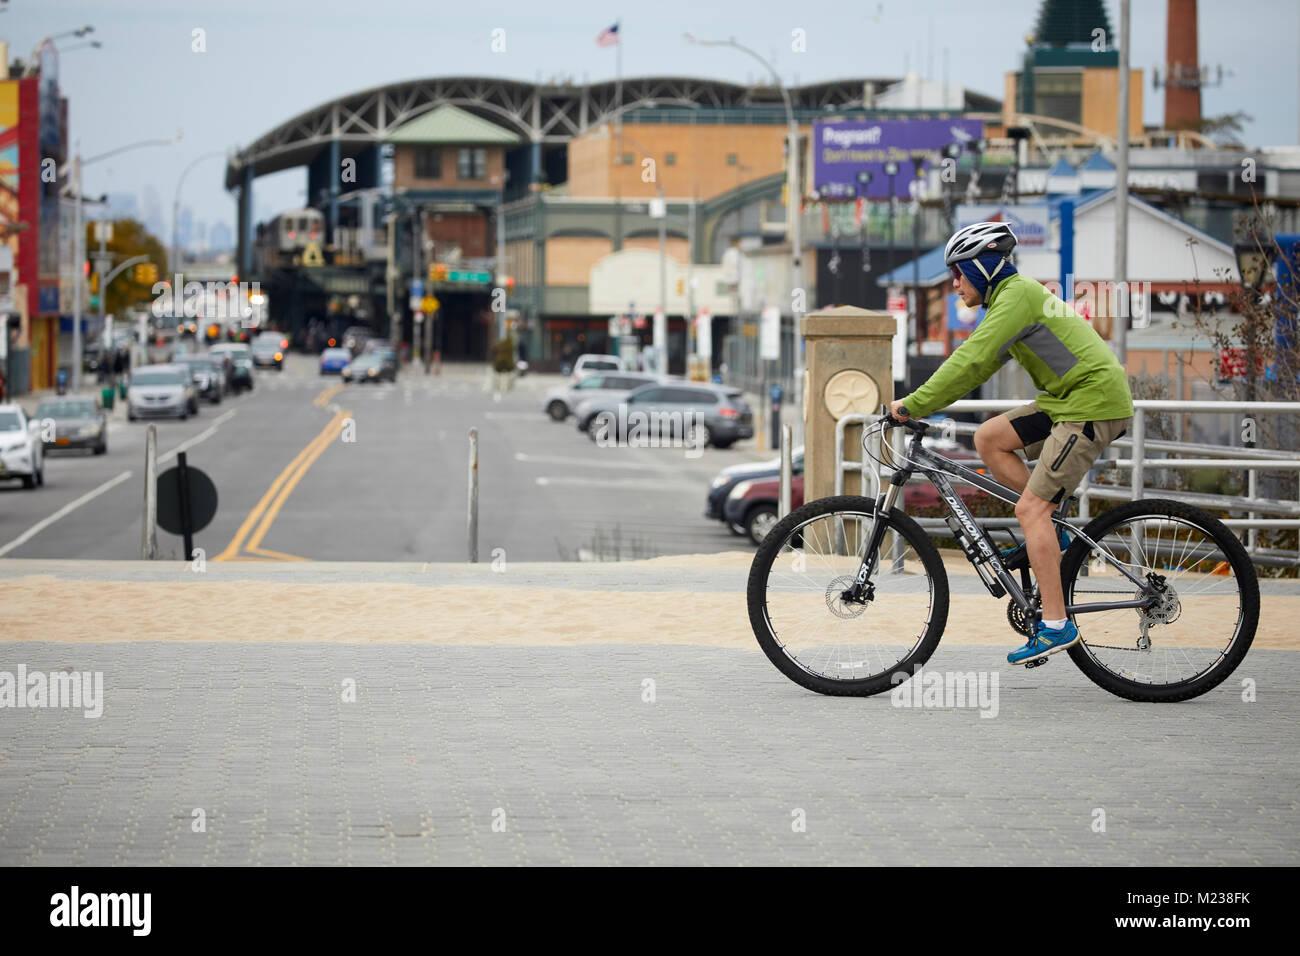 New York city  Coney Island–Stillwell Avenue Subway terminal in Brooklyn, cycling bike cyclist  on the beach promenade Stock Photo